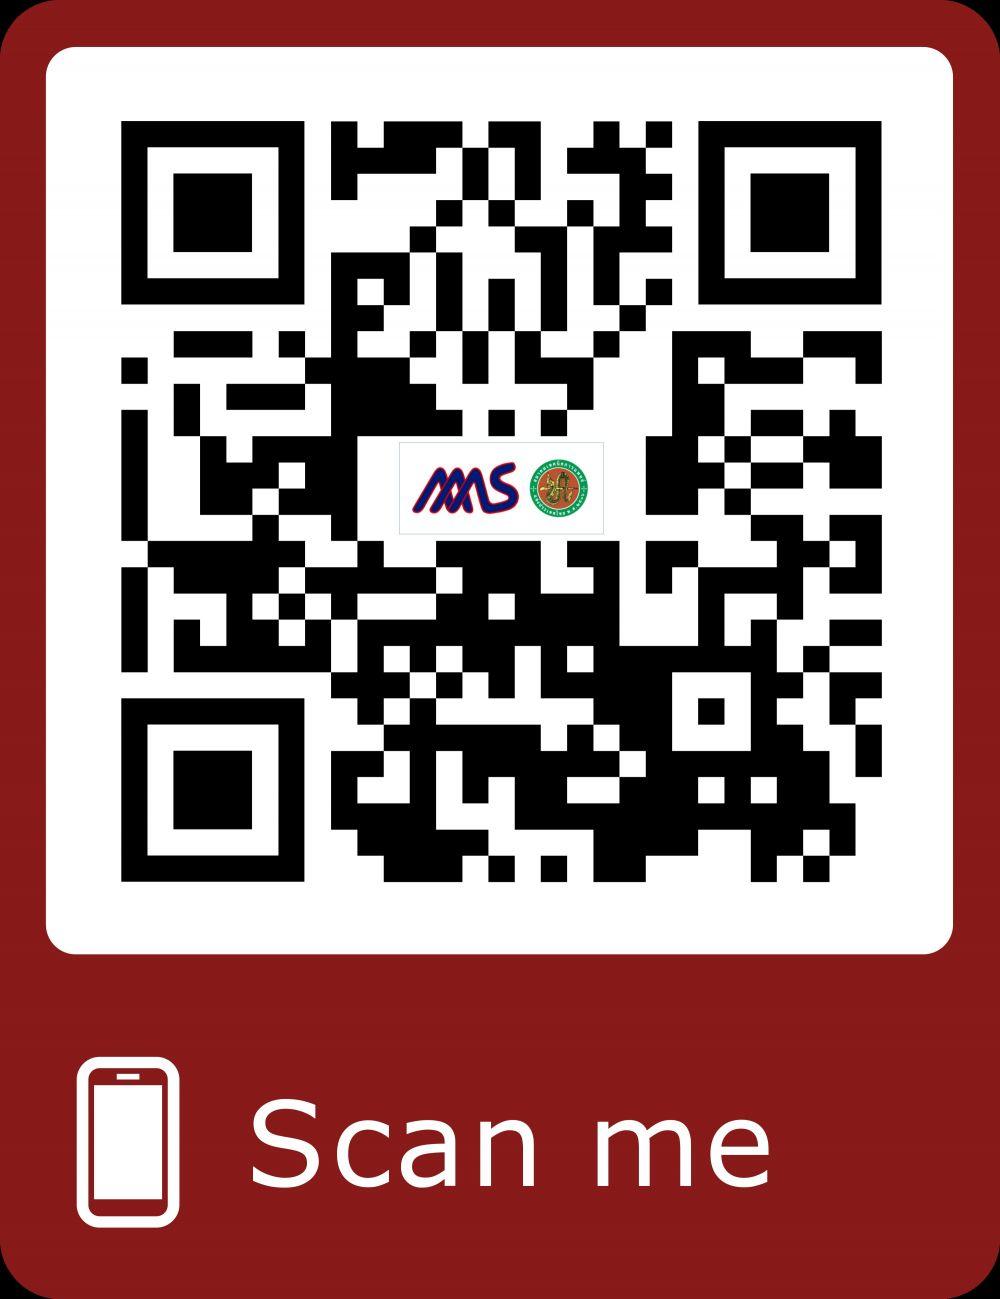 QRcode_43AMTT_AAMLS2019_Speaker_s_Hand-out.png